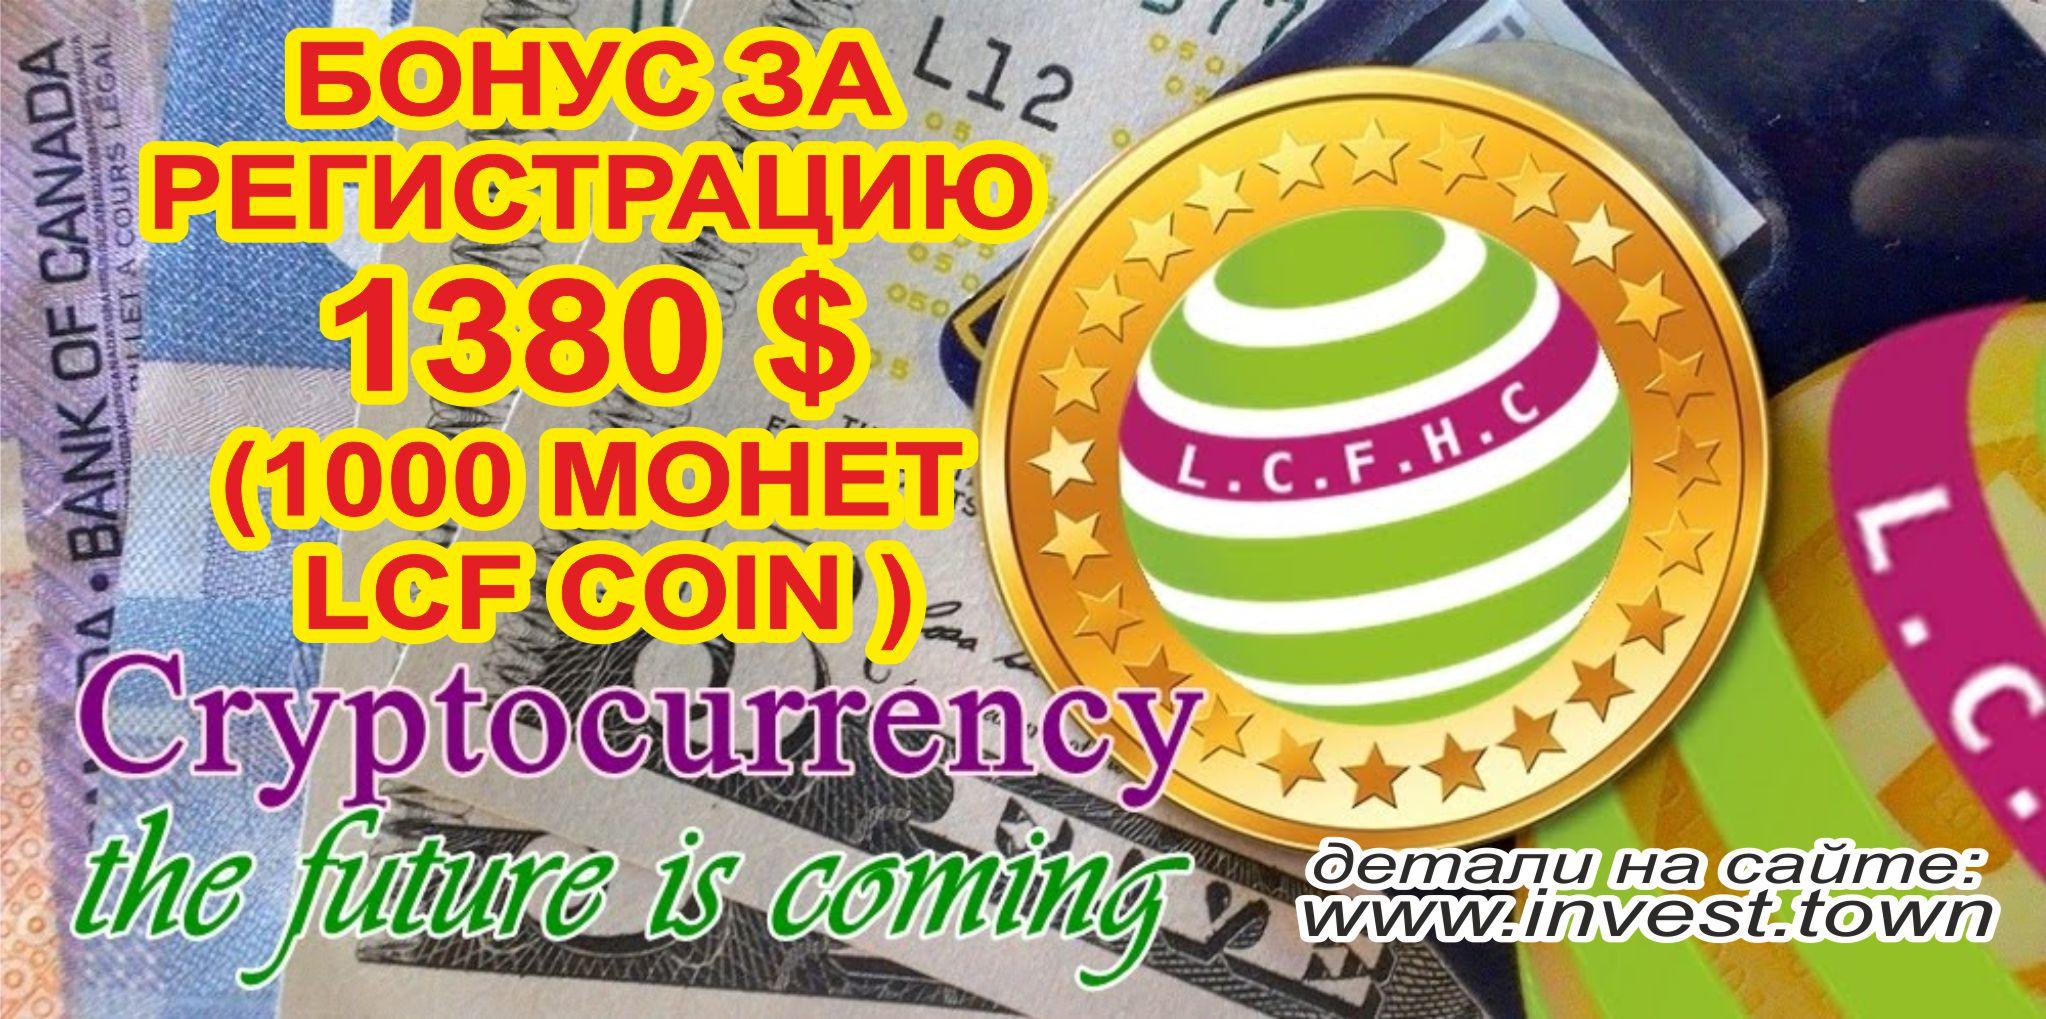 LCF bonus 3